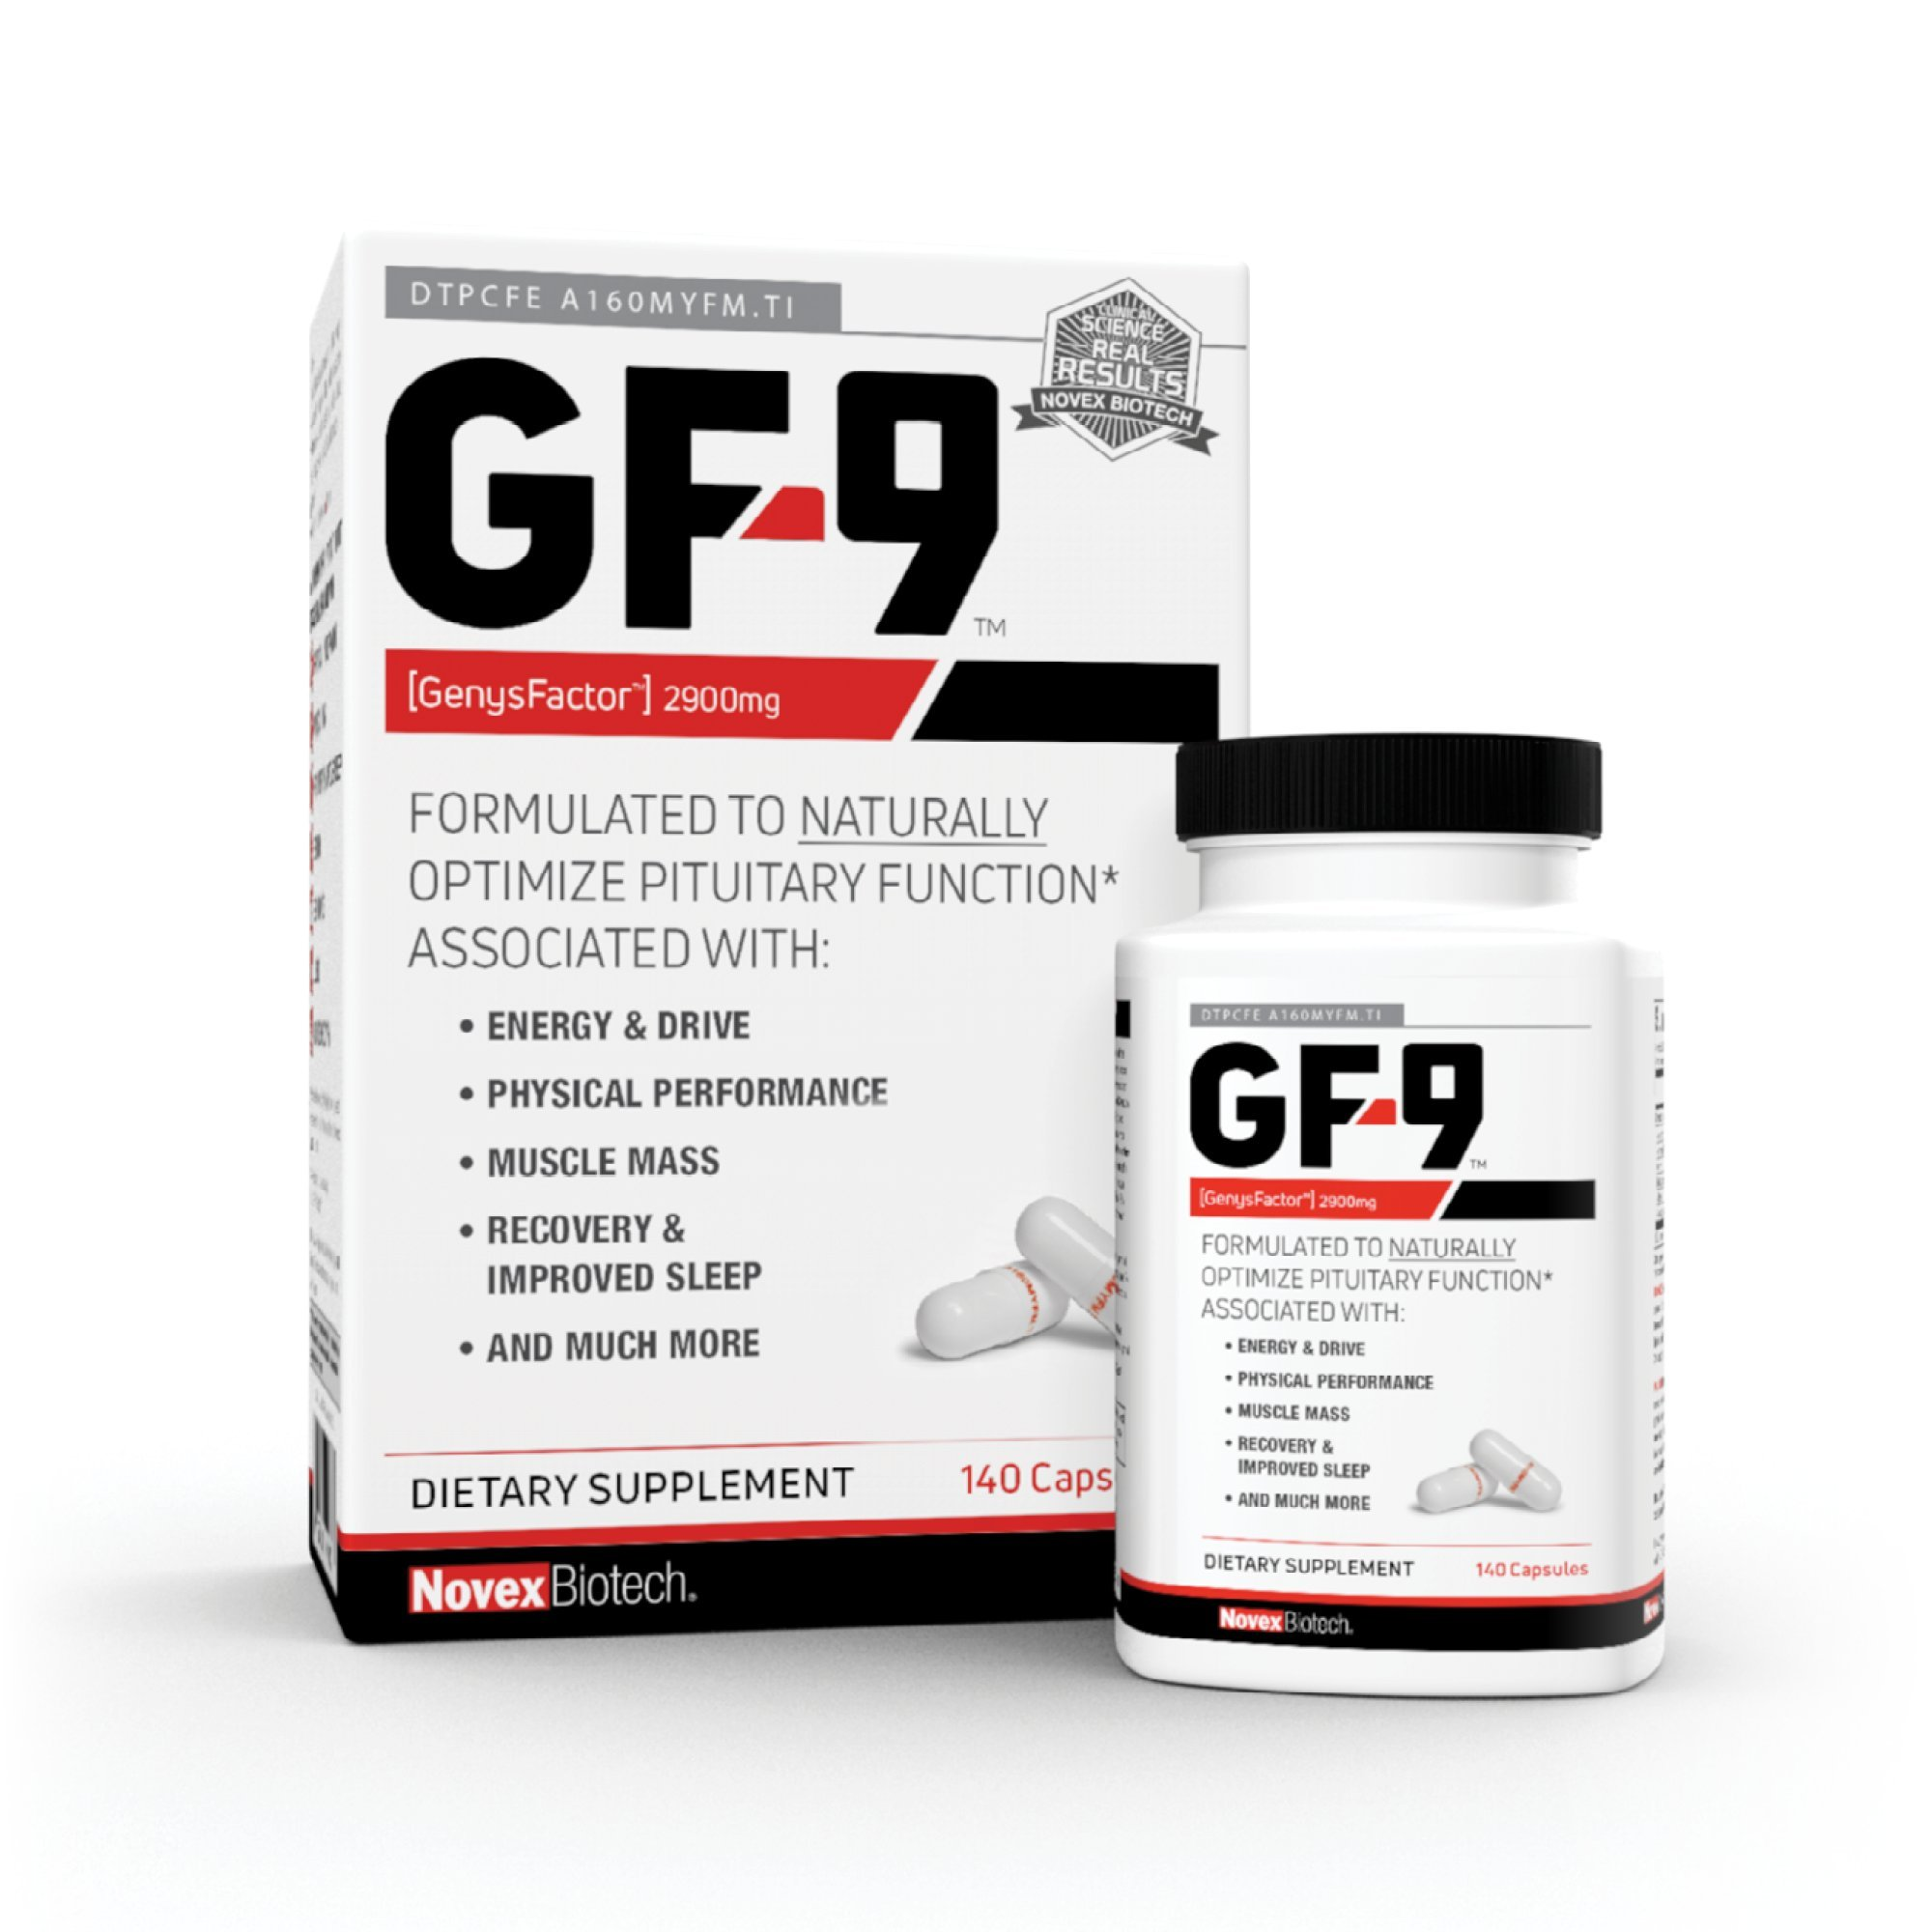 Novex Biotech GF-9 Multivitamins, 140 Count